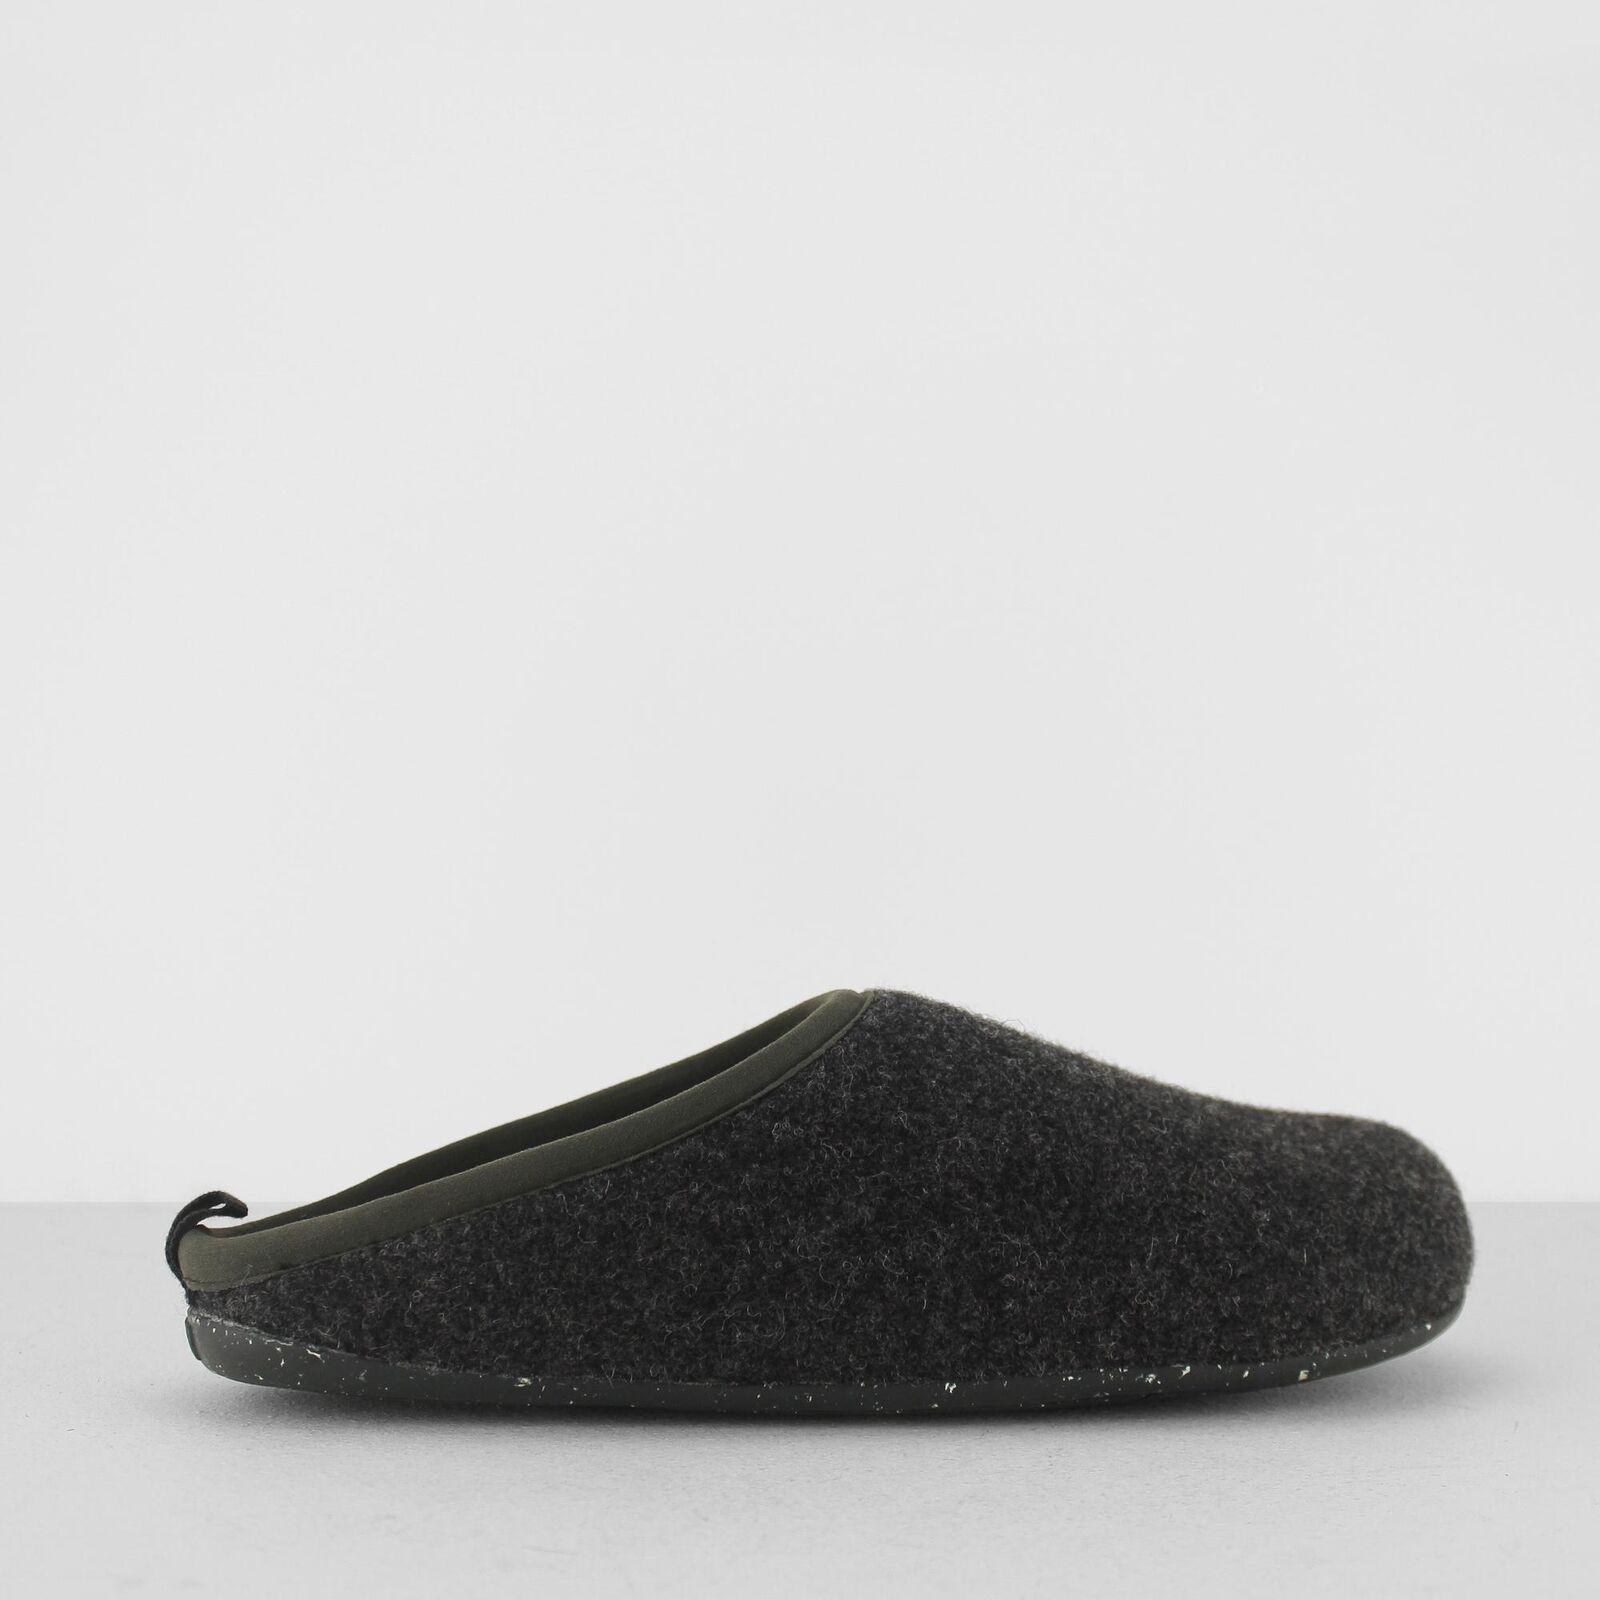 CAMPER Wabi da Uomo Elegante Ergonomica Anatomica Woolen Comfort Mule Pantofole Grigio